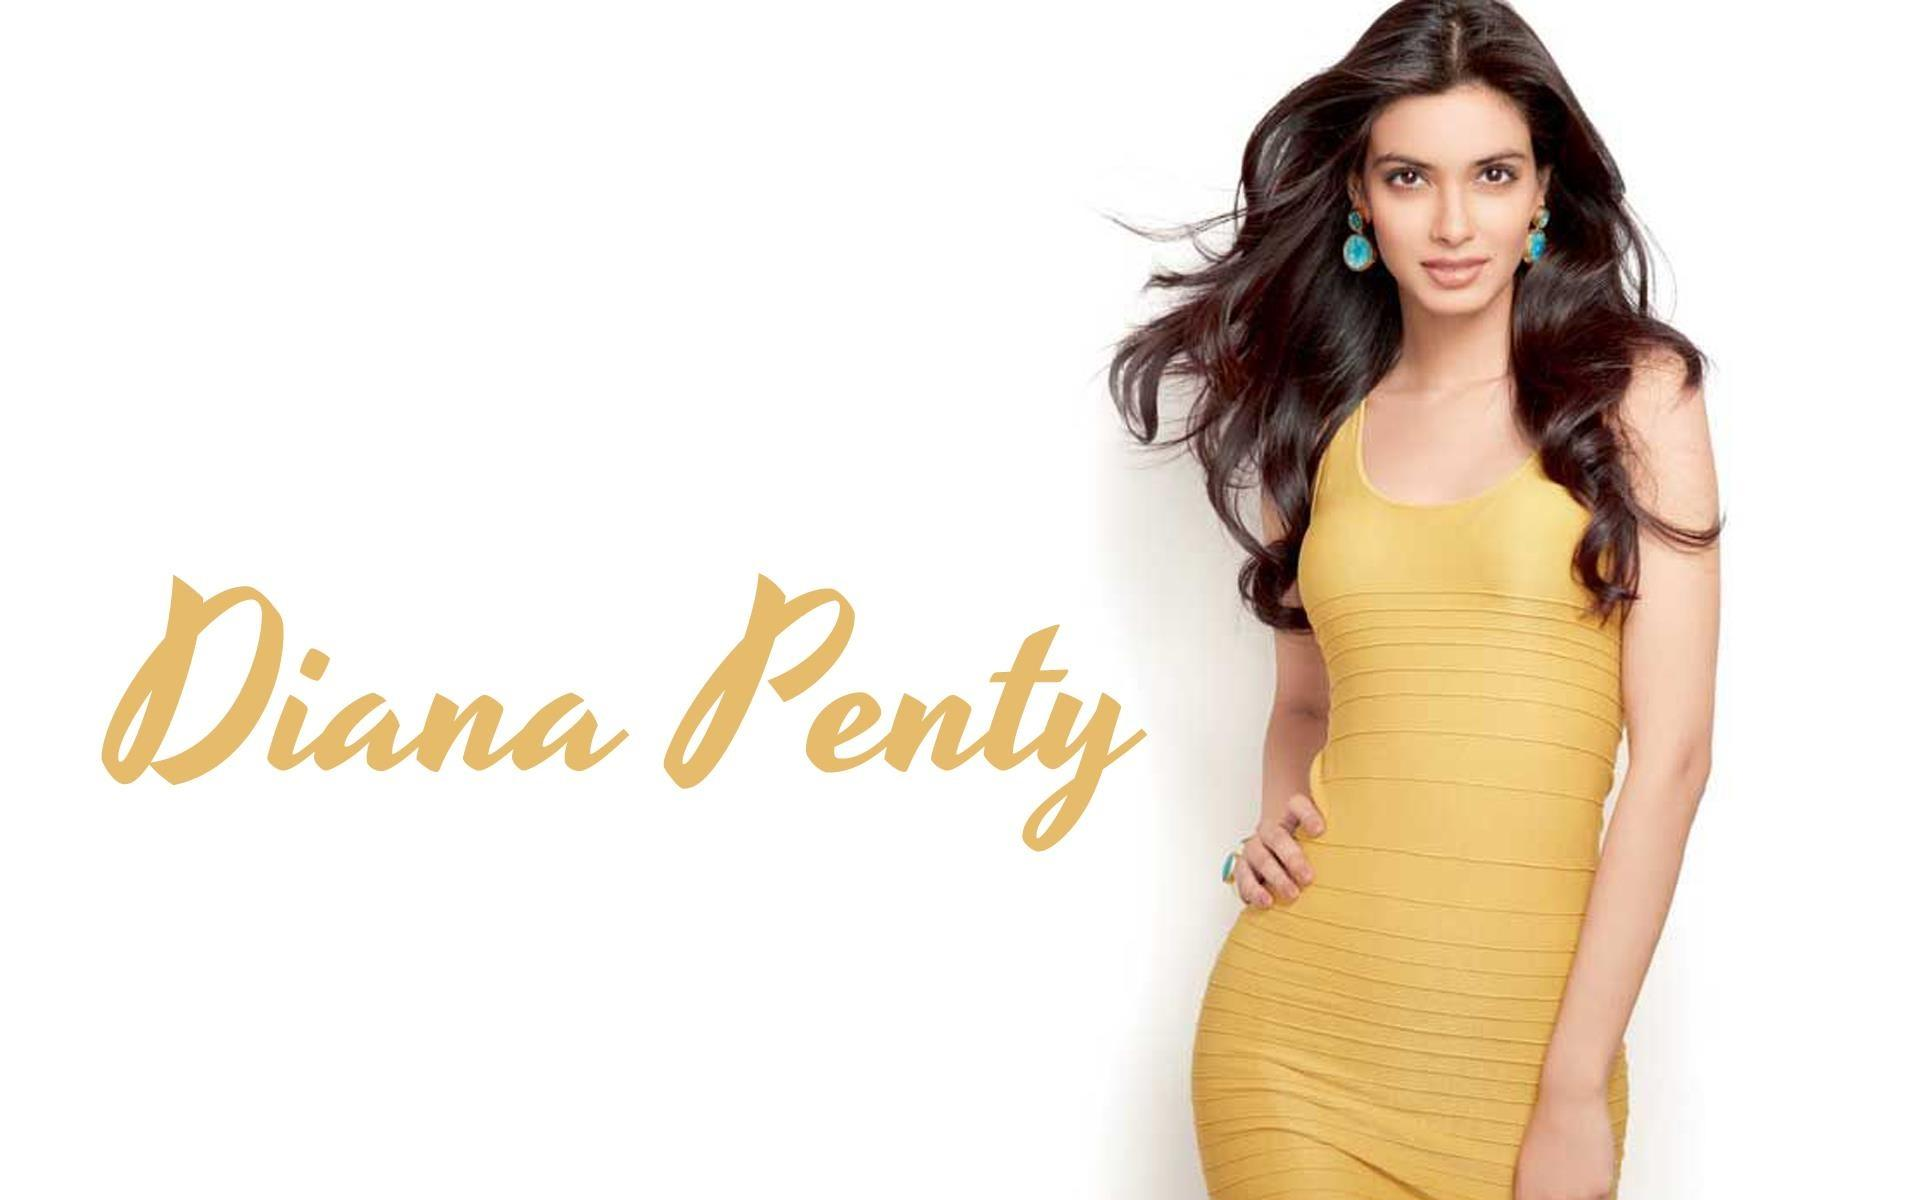 Diana Penty looks hot in yellow dress